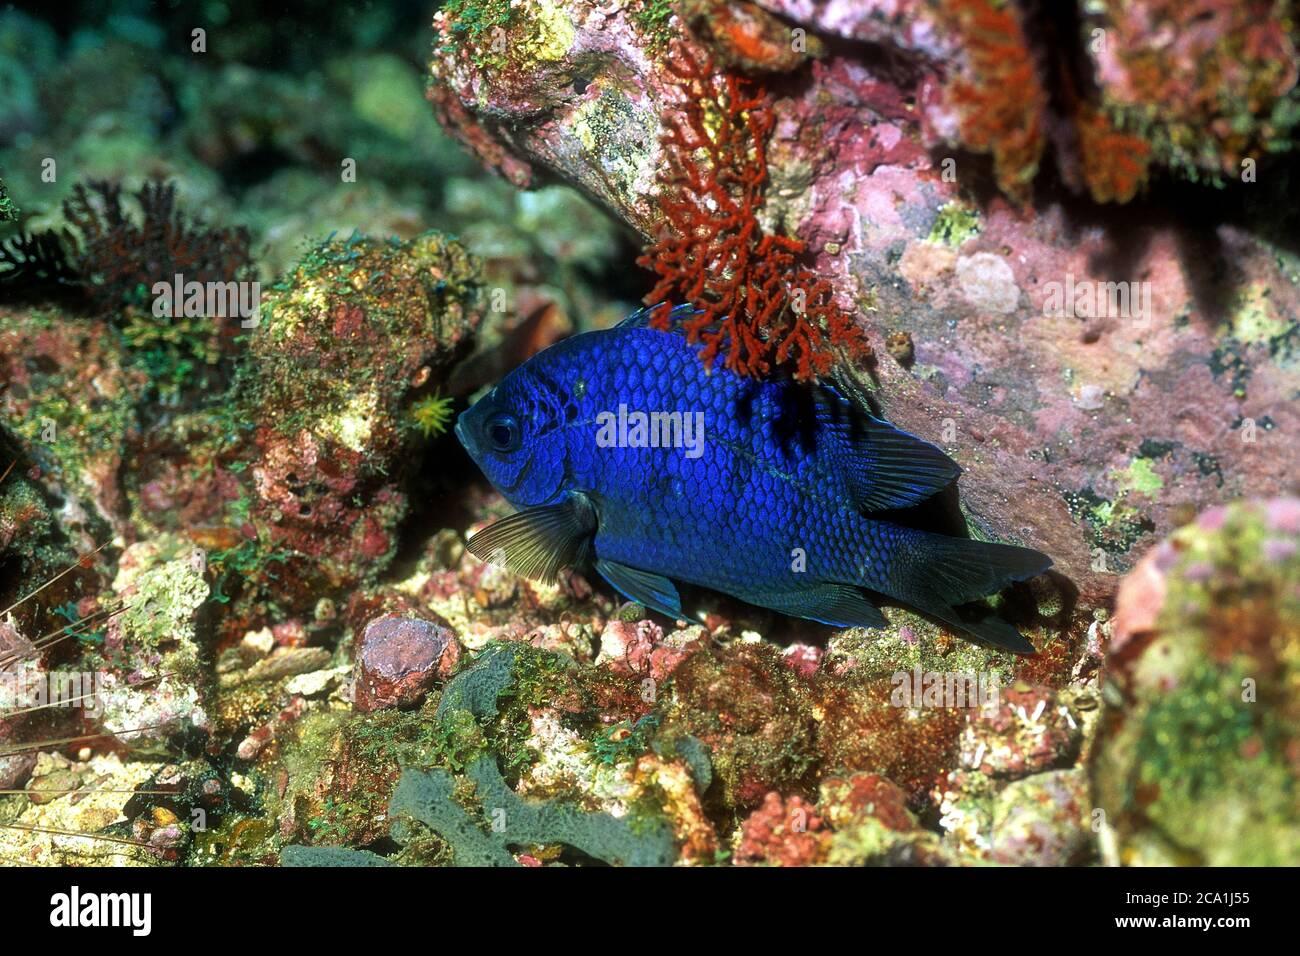 Blue Damselfish, Cadenat's Chromis, 'Chromis cadenati', Sleeping, Near Corals, Rolas Island, Sao Tome Stock Photo